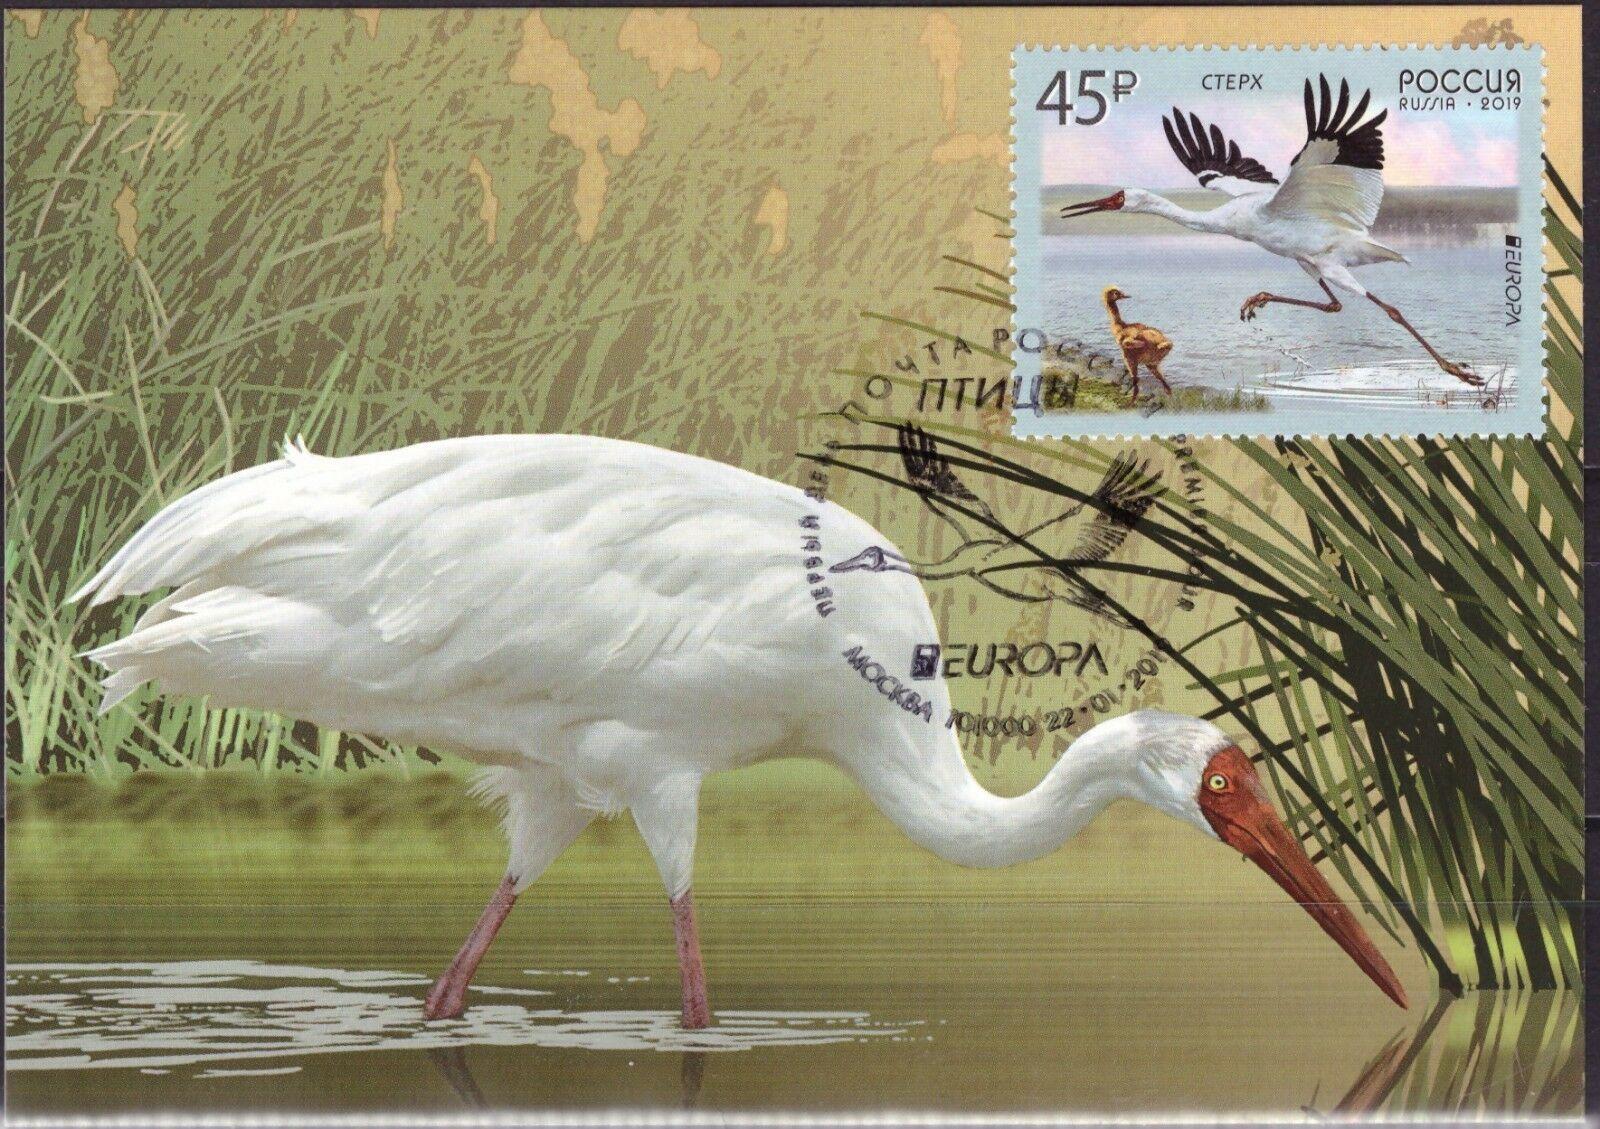 Russia - Europa 2019: National Birds (January 22, 2019) maximum card